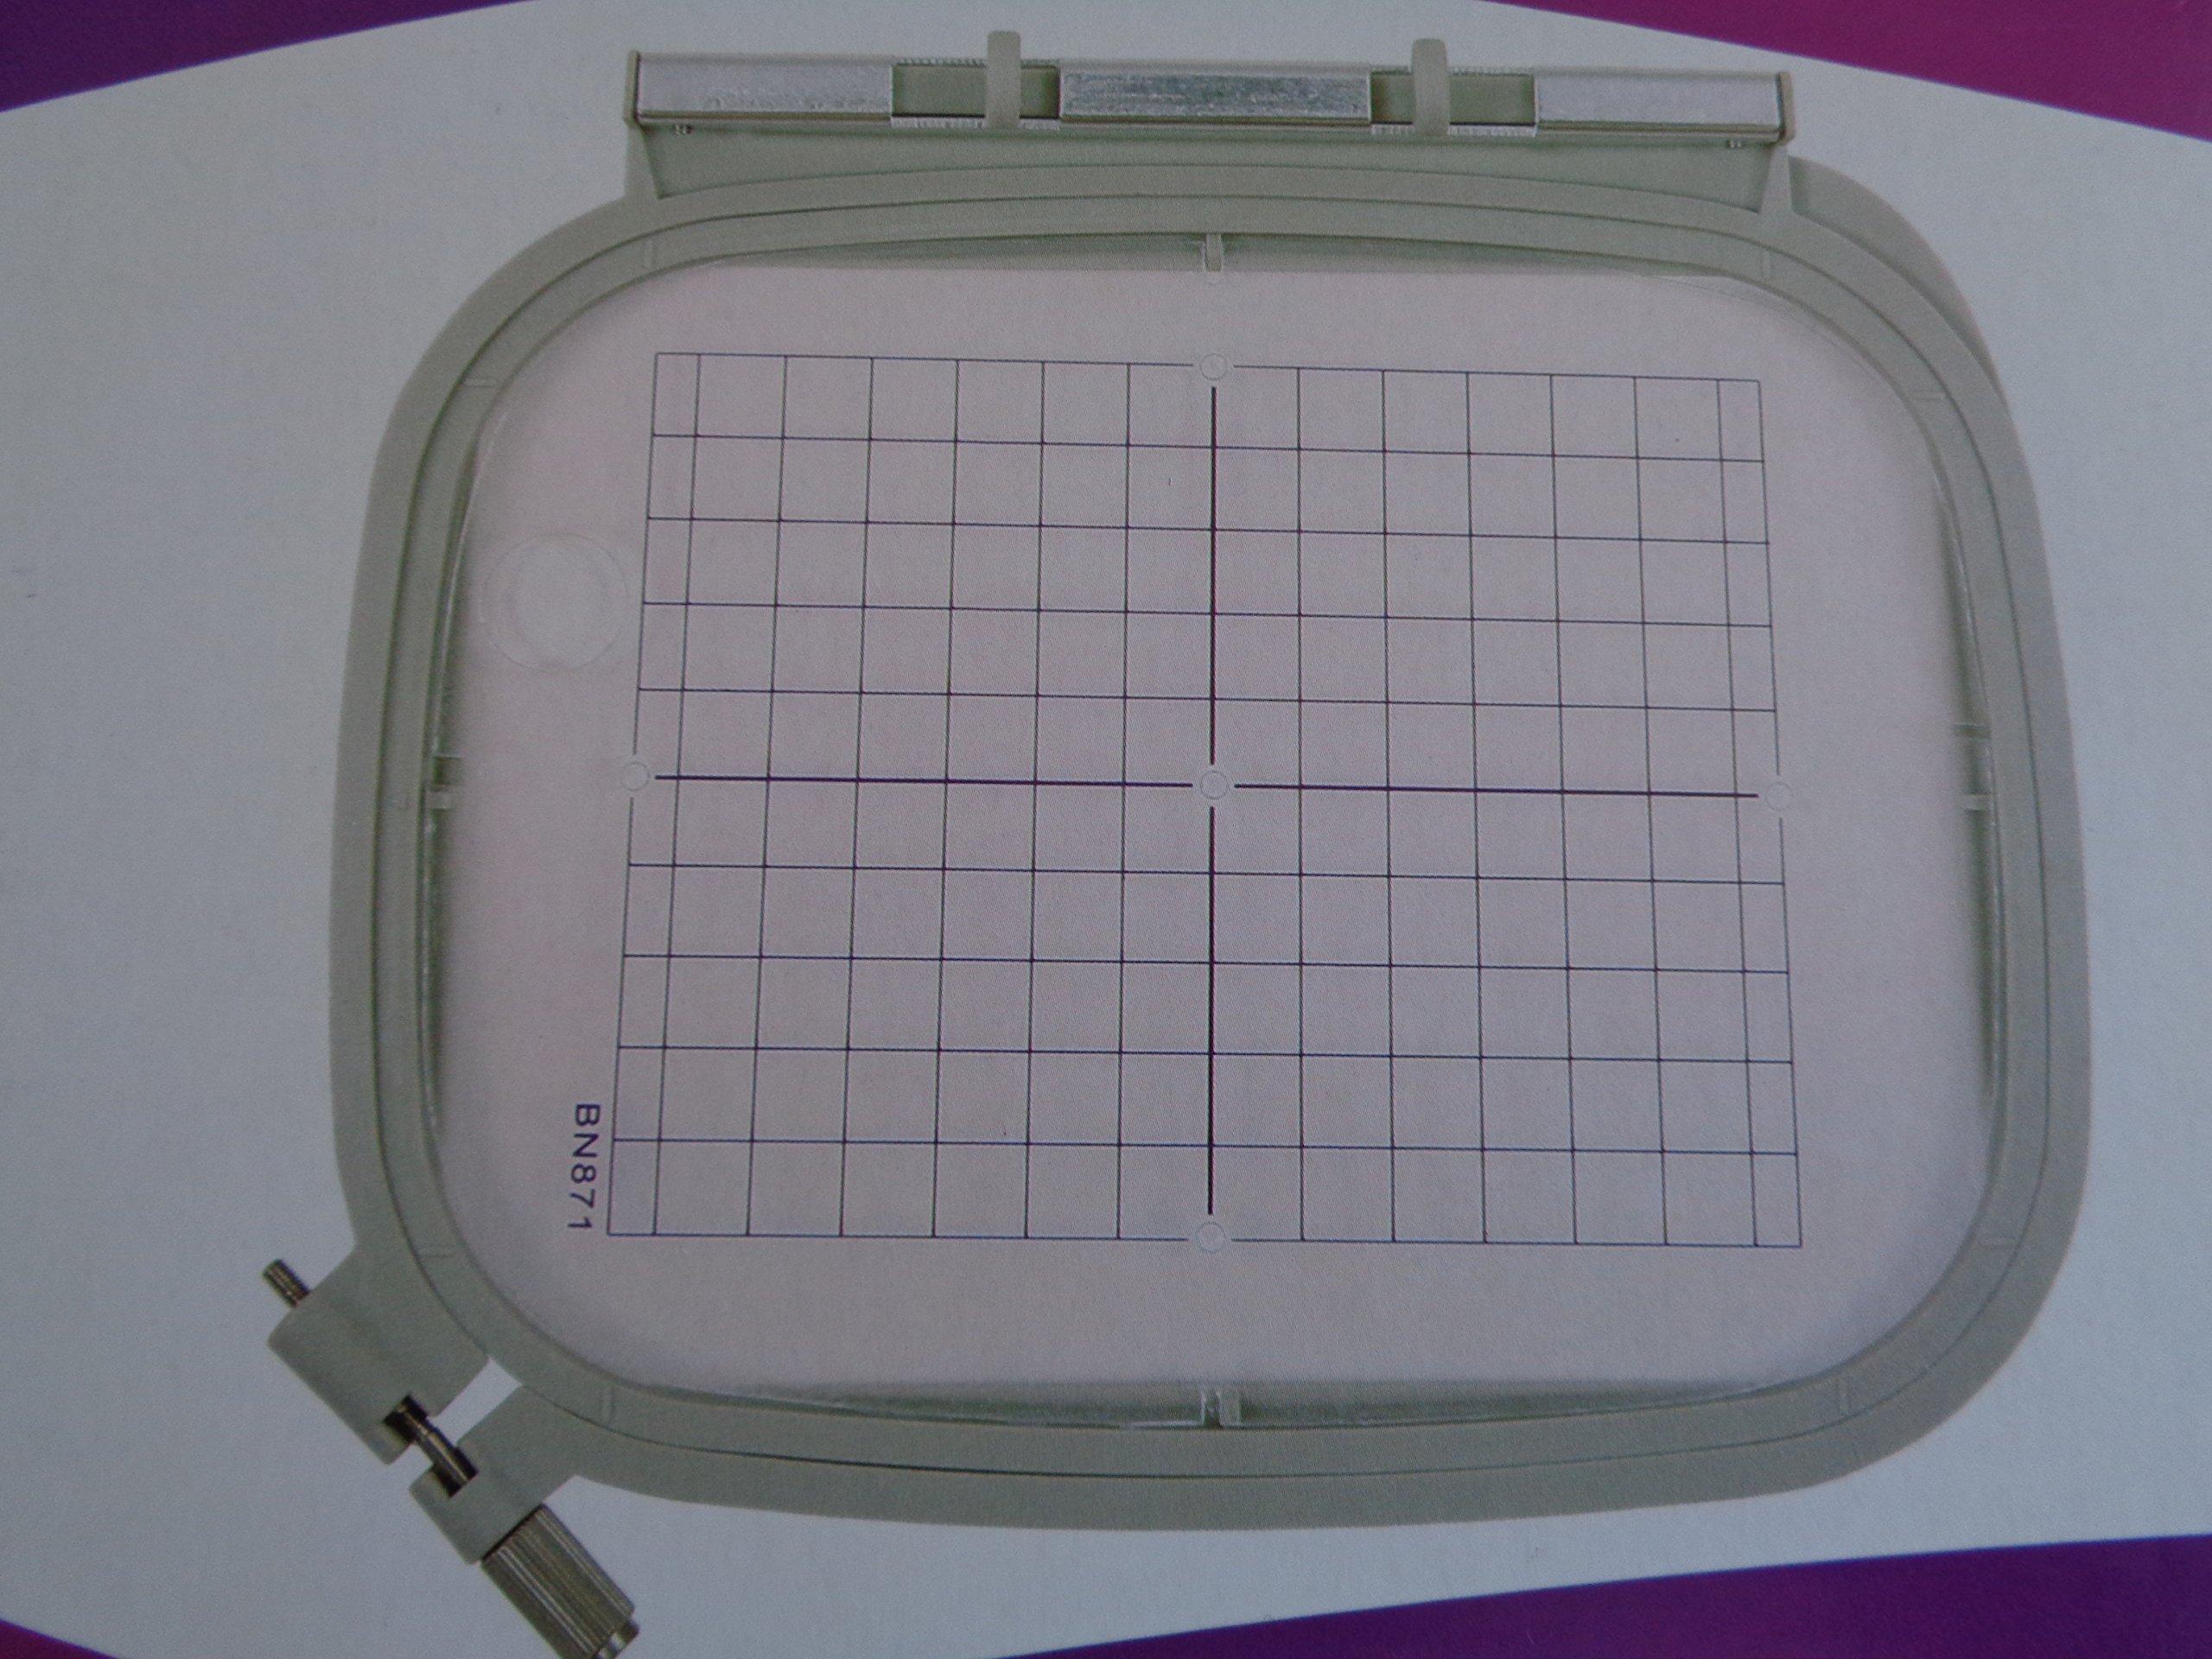 145mm X 255mm Large Hoop For Bernina Artista 185 200 B580 630 640 730 780 830